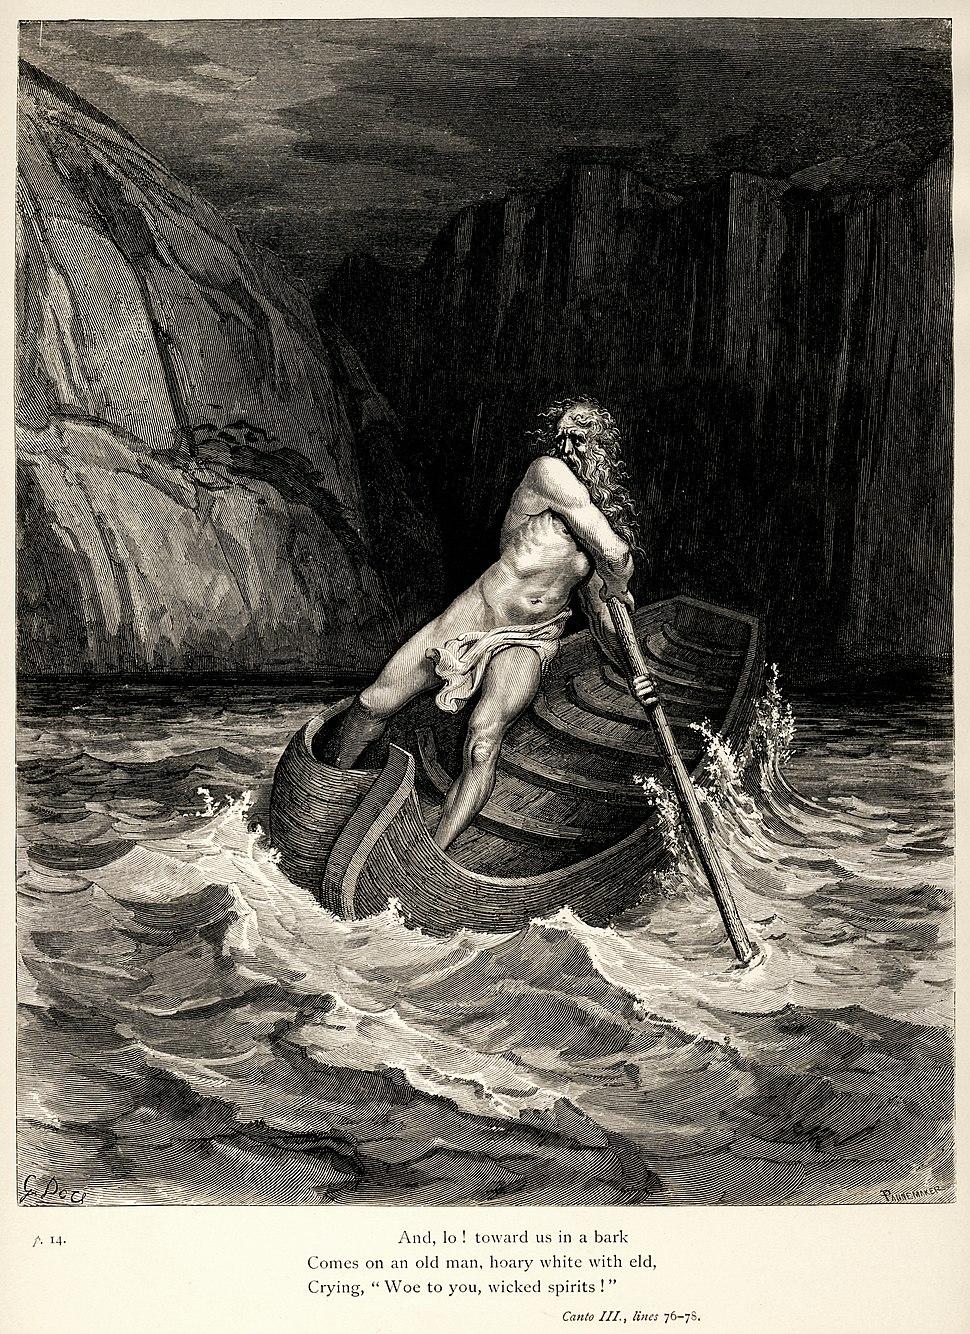 Gustave Doré - Dante Alighieri - Inferno - Plate 9 (Canto III - Charon)